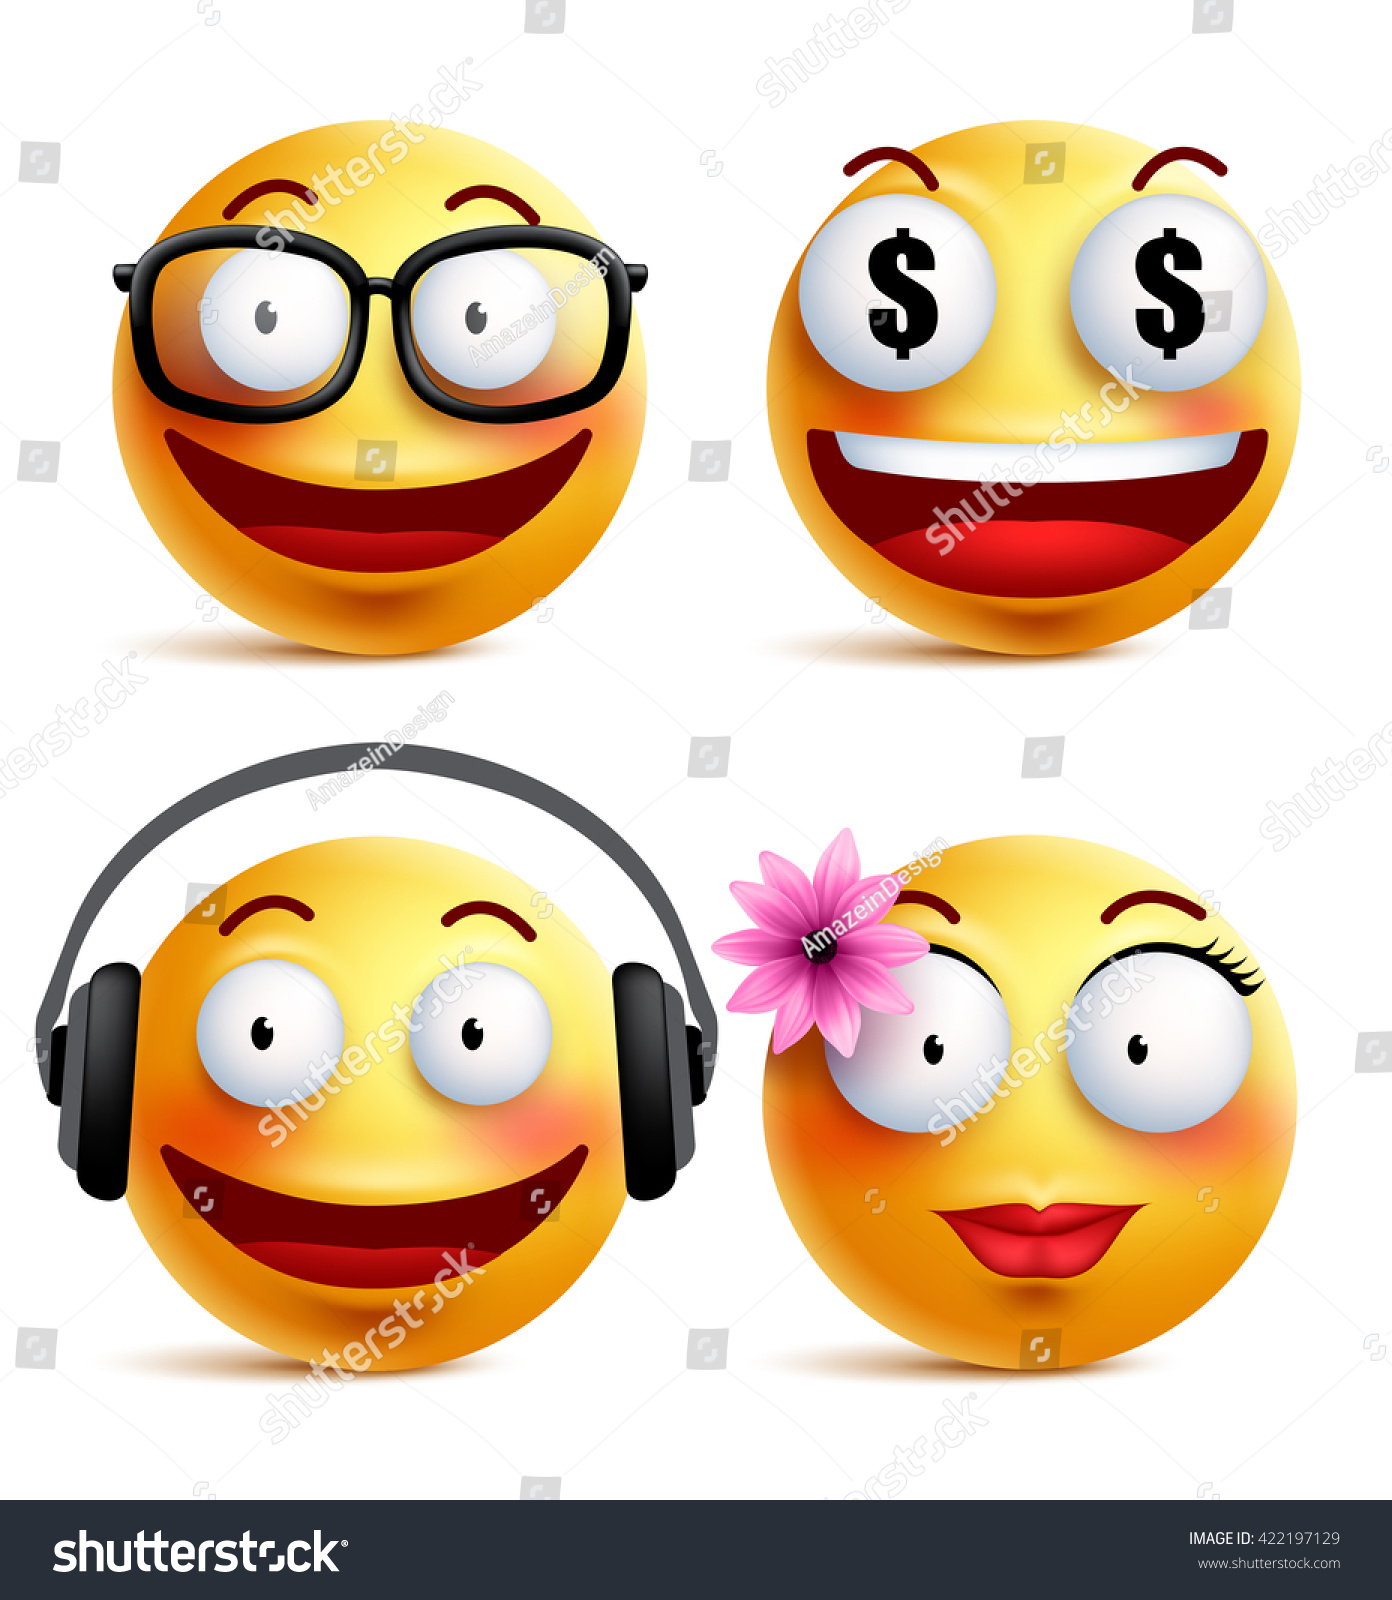 Emoji Yellow Emoticons Smiley Faces Collection Stock Vector Royalty